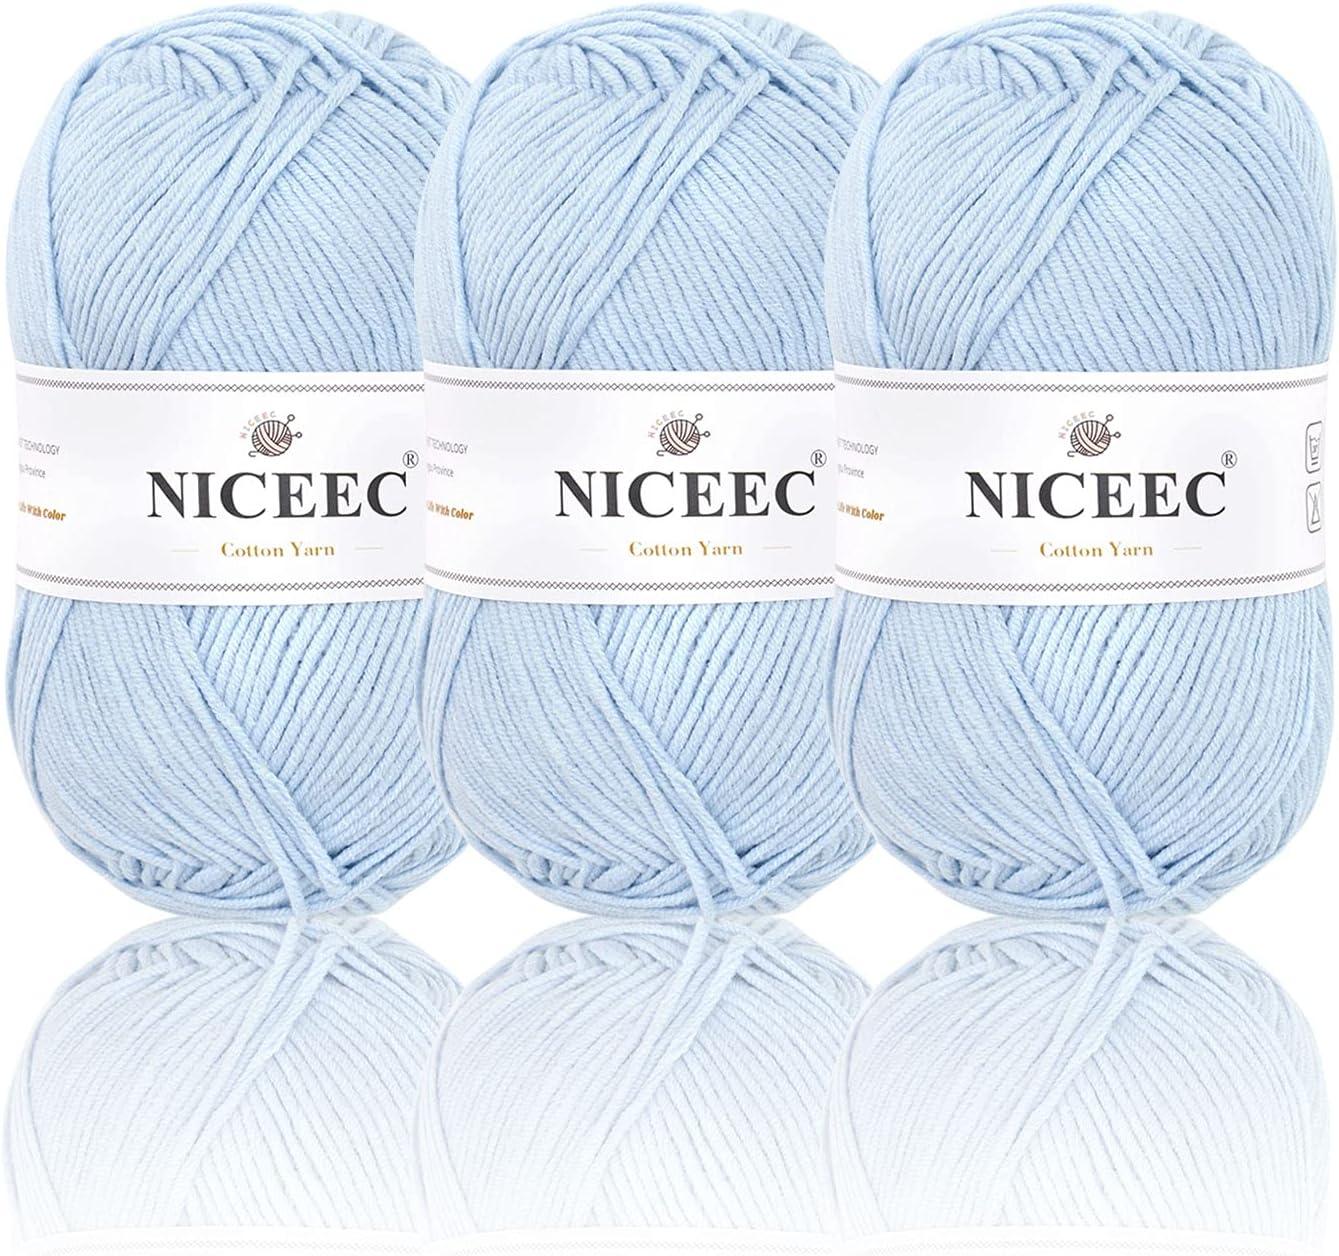 NICEEC 3 Washington Mall Skeins Soft Max 78% OFF Cotton 5ply Baby for Knitt Yarn